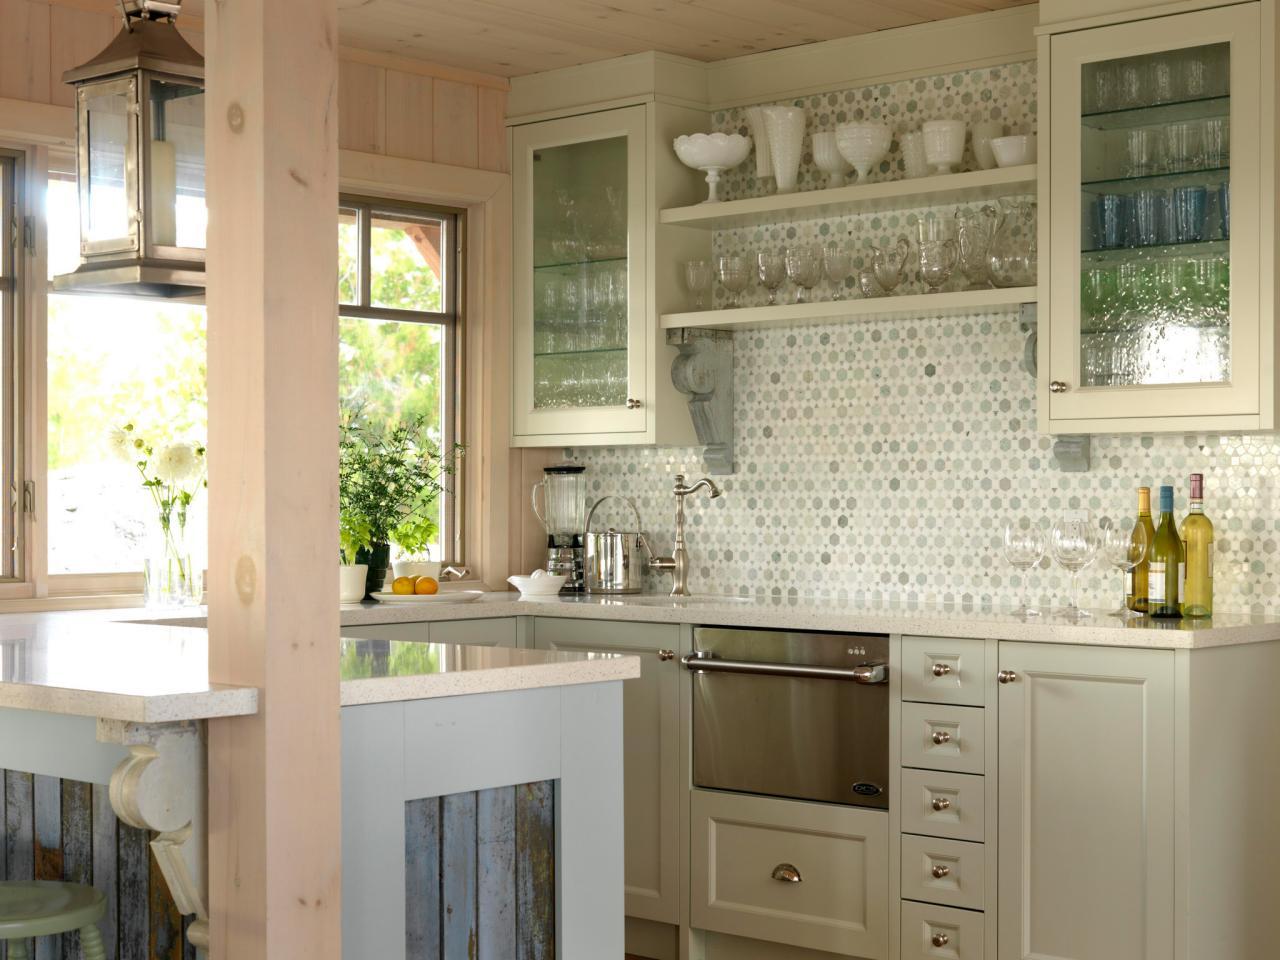 hssuh105_kitchen-med-glas-face-cabinets_4x3-jpg-rend-hgtvcom-1280-960